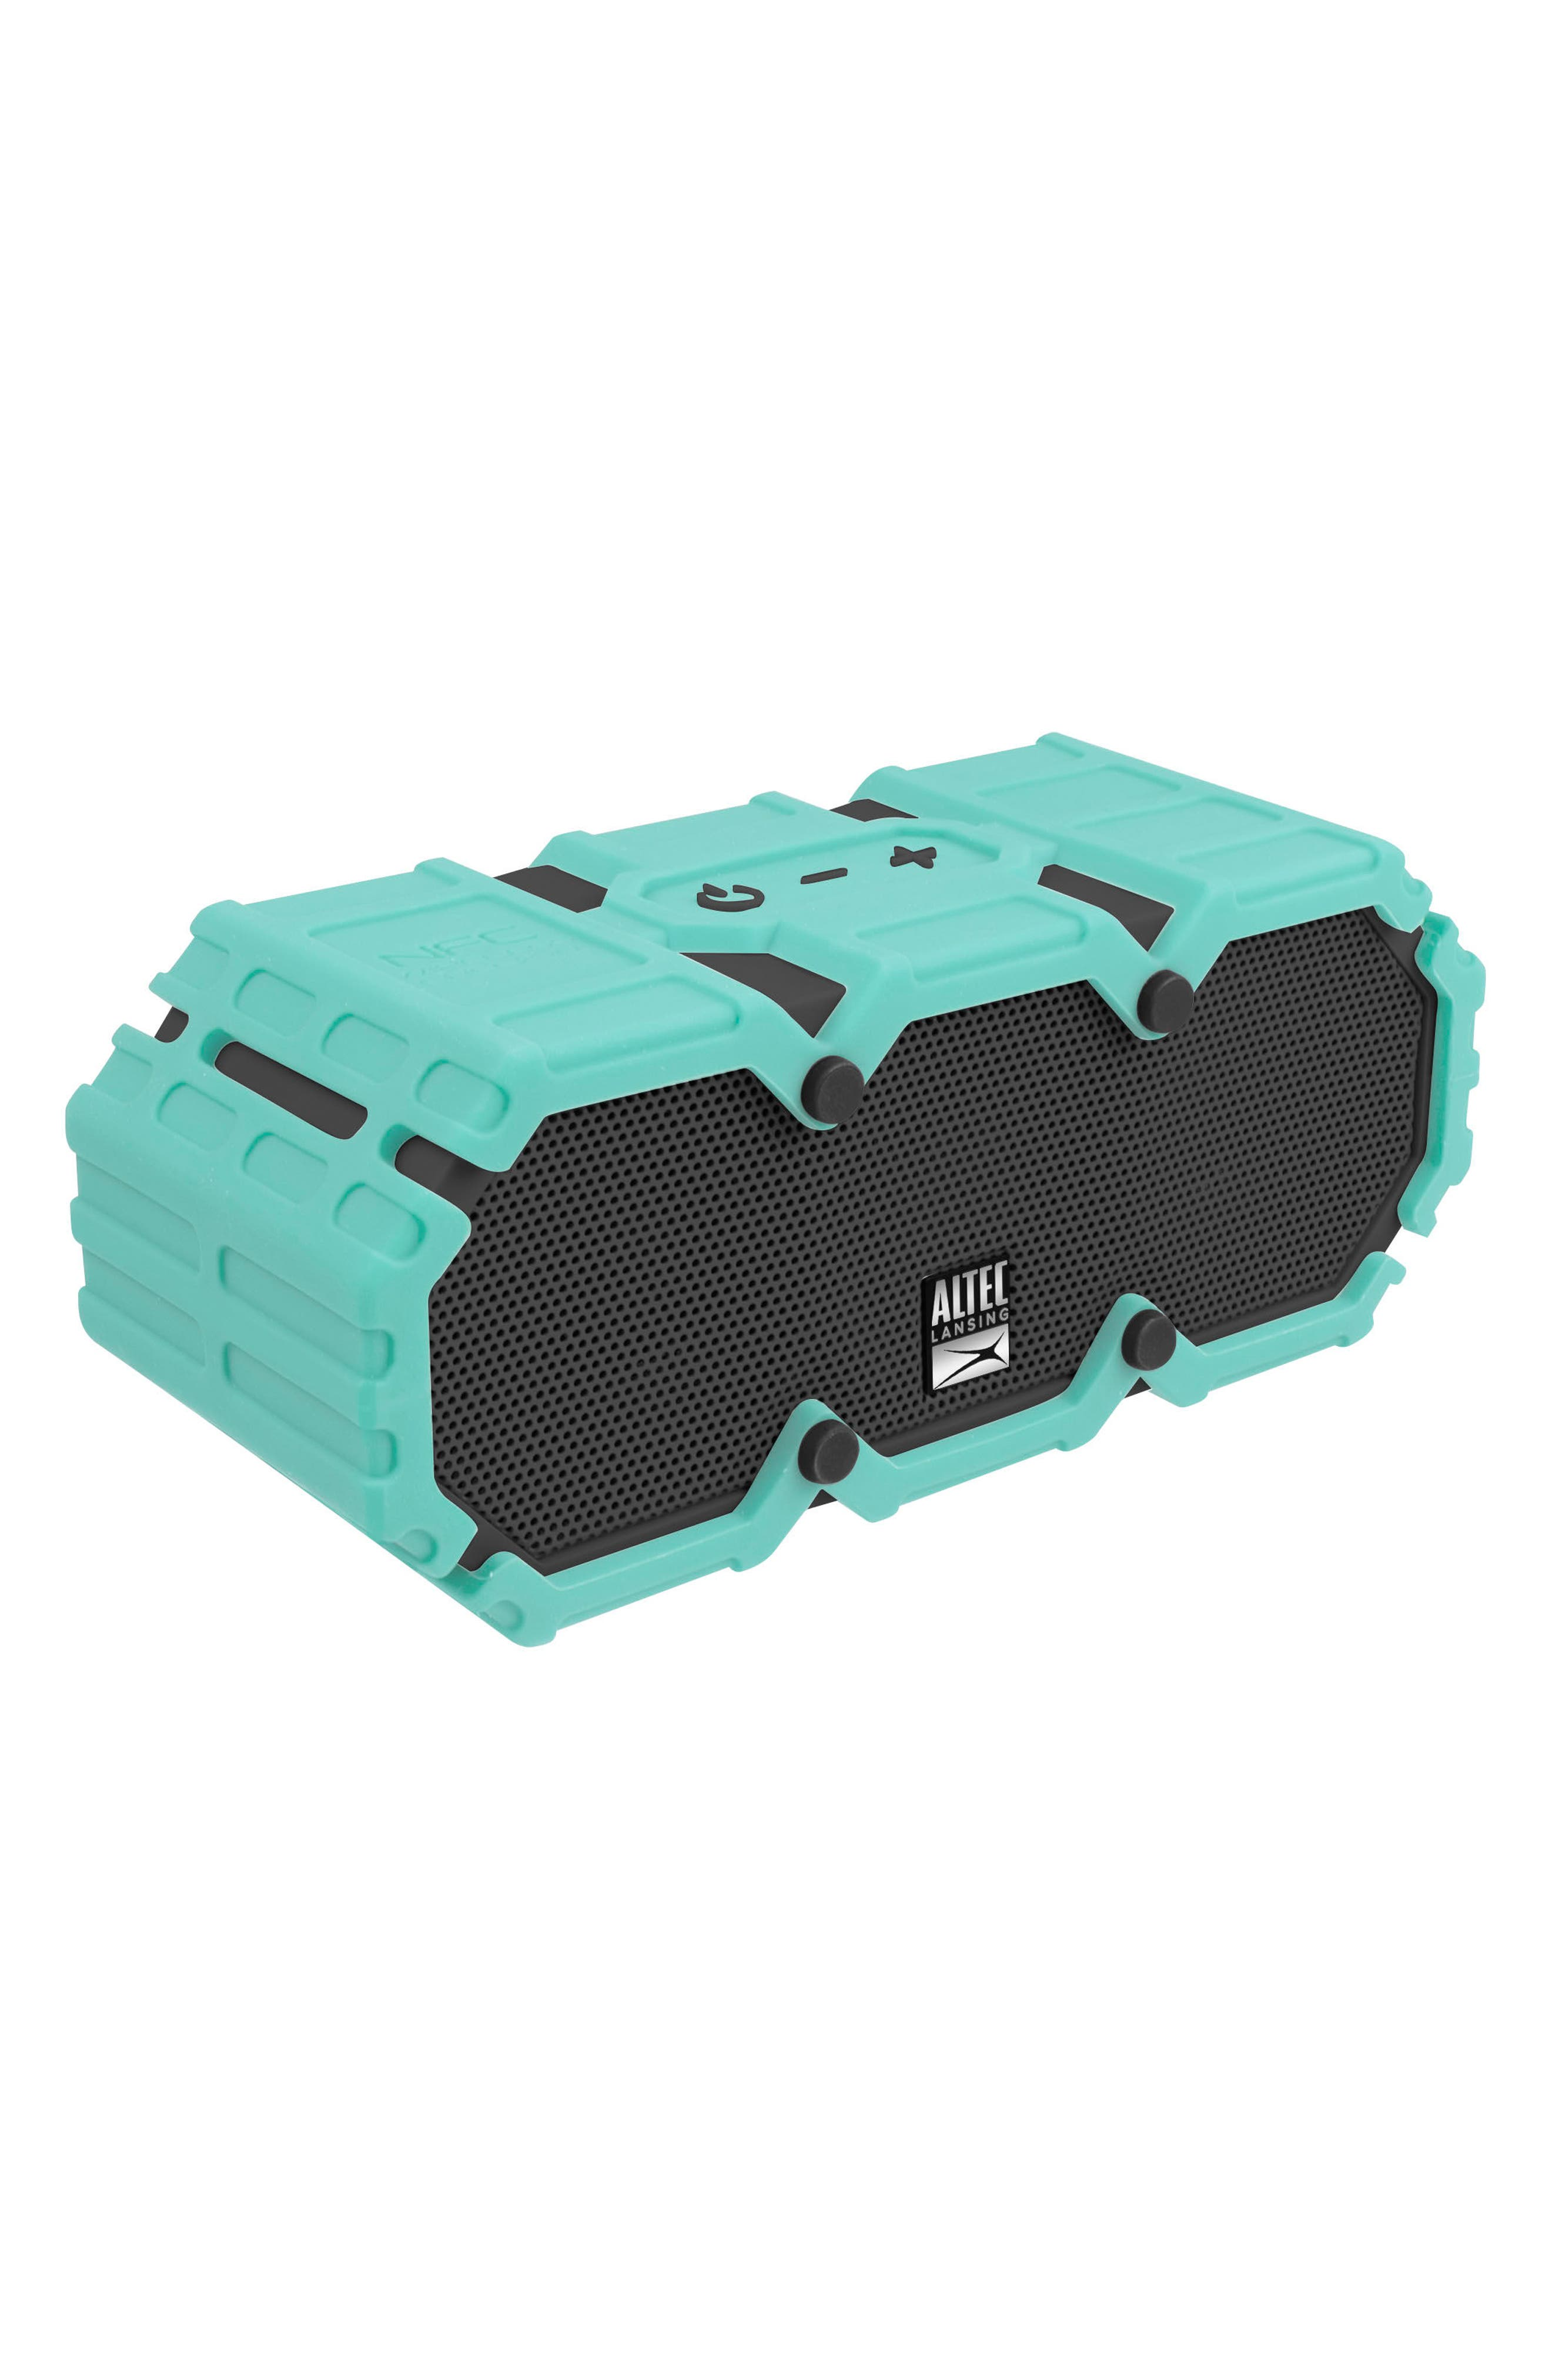 Mini Lifejacket S3 Waterproof Wireless Speaker,                             Alternate thumbnail 3, color,                             MINT GREEN/ DARK GREY